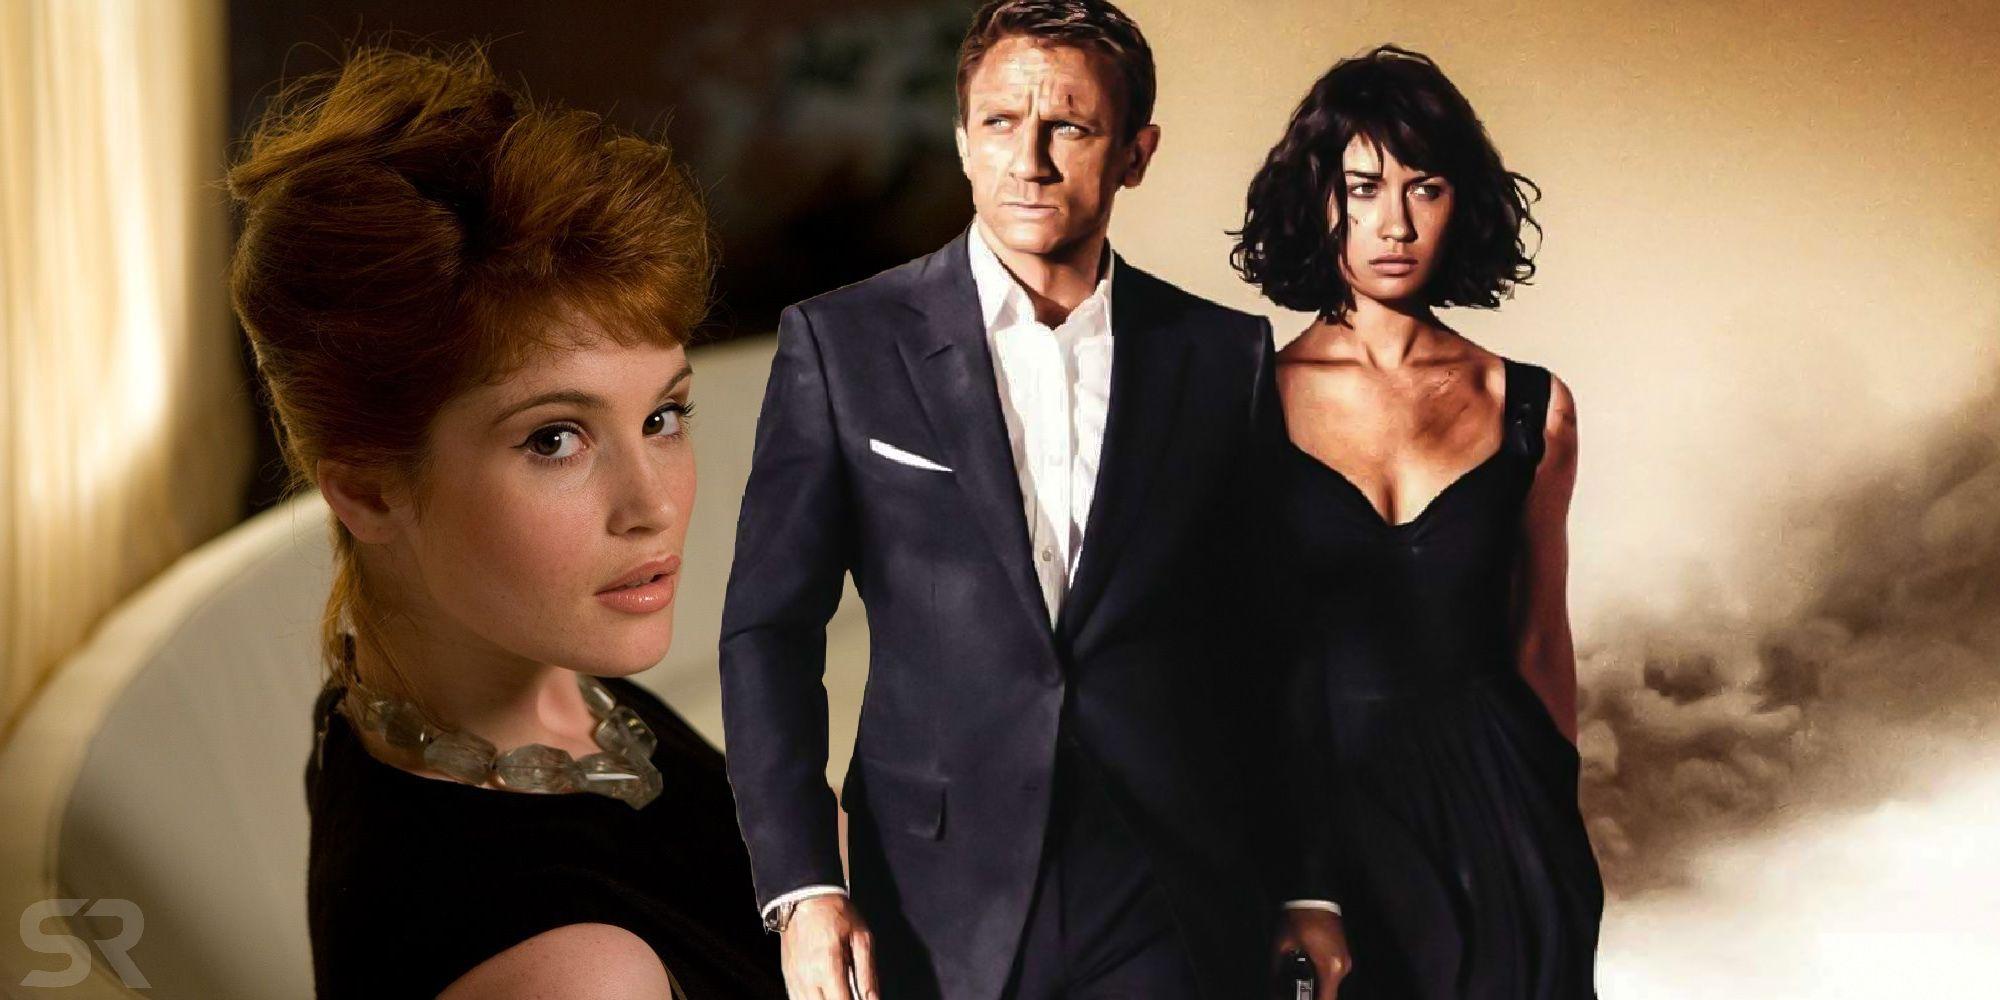 Bond stana katic james Stana Katic